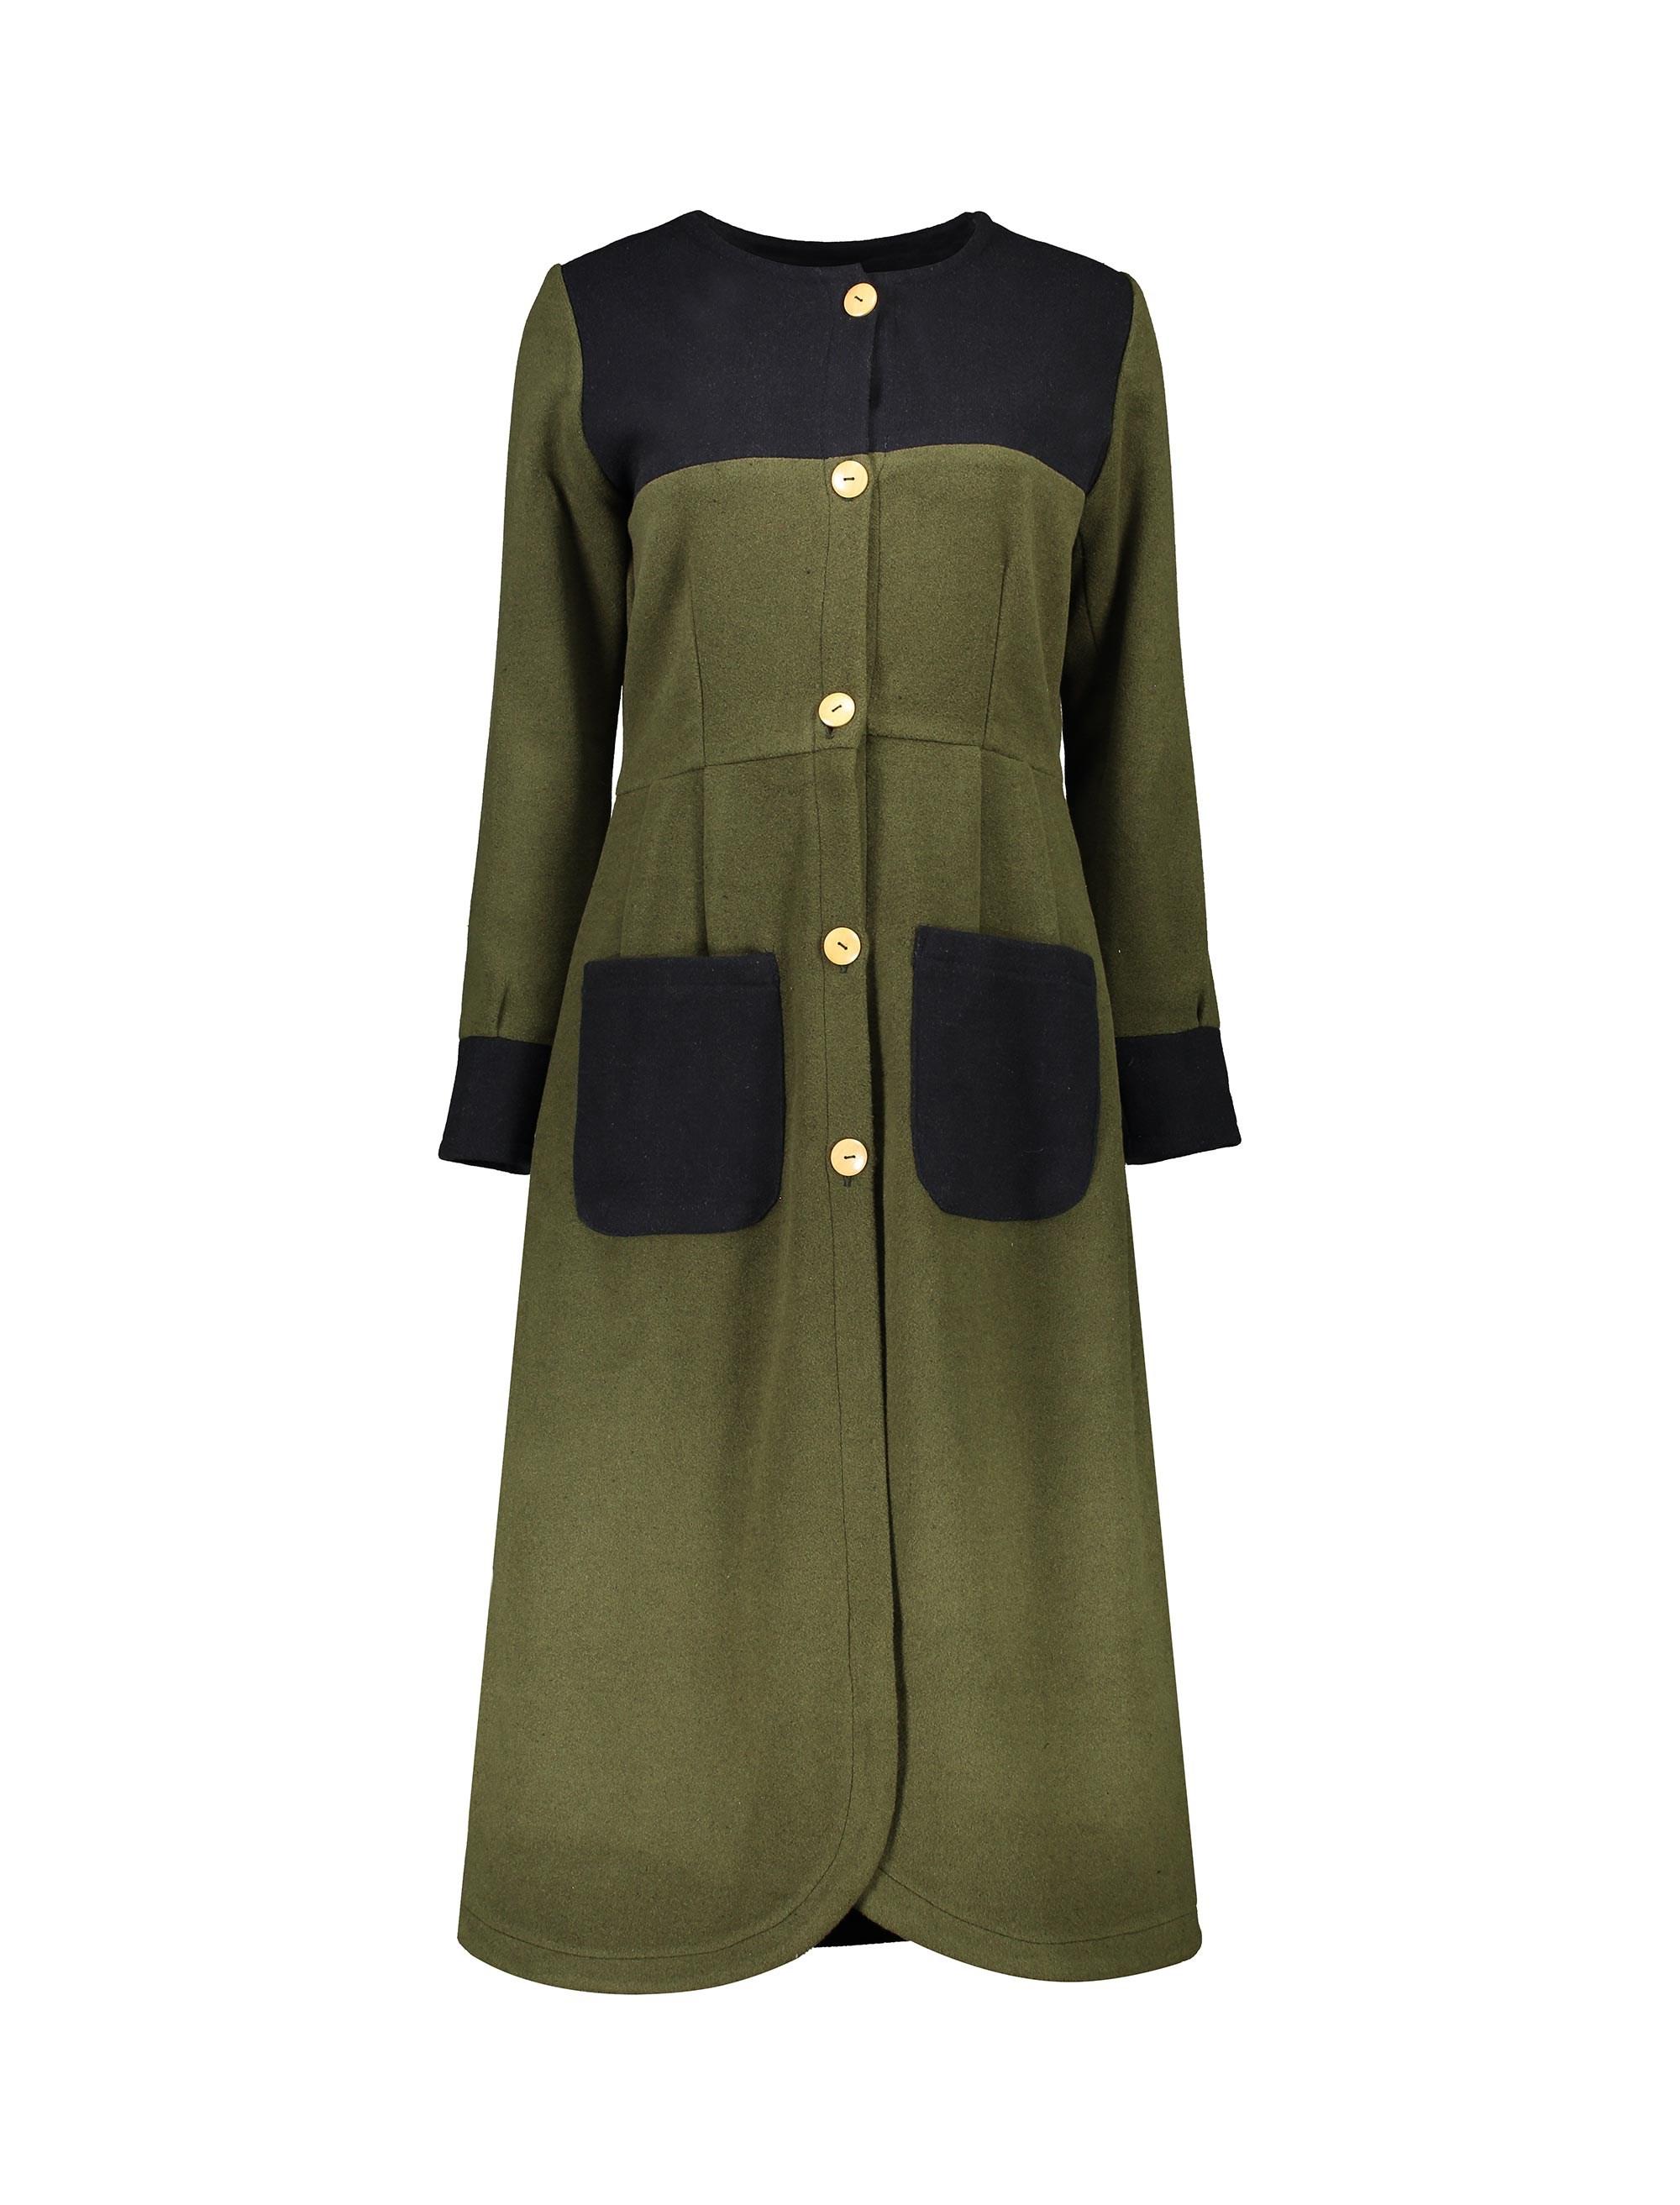 پالتو بلند زنانه - سبز ارتشي/سرمهاي - 1